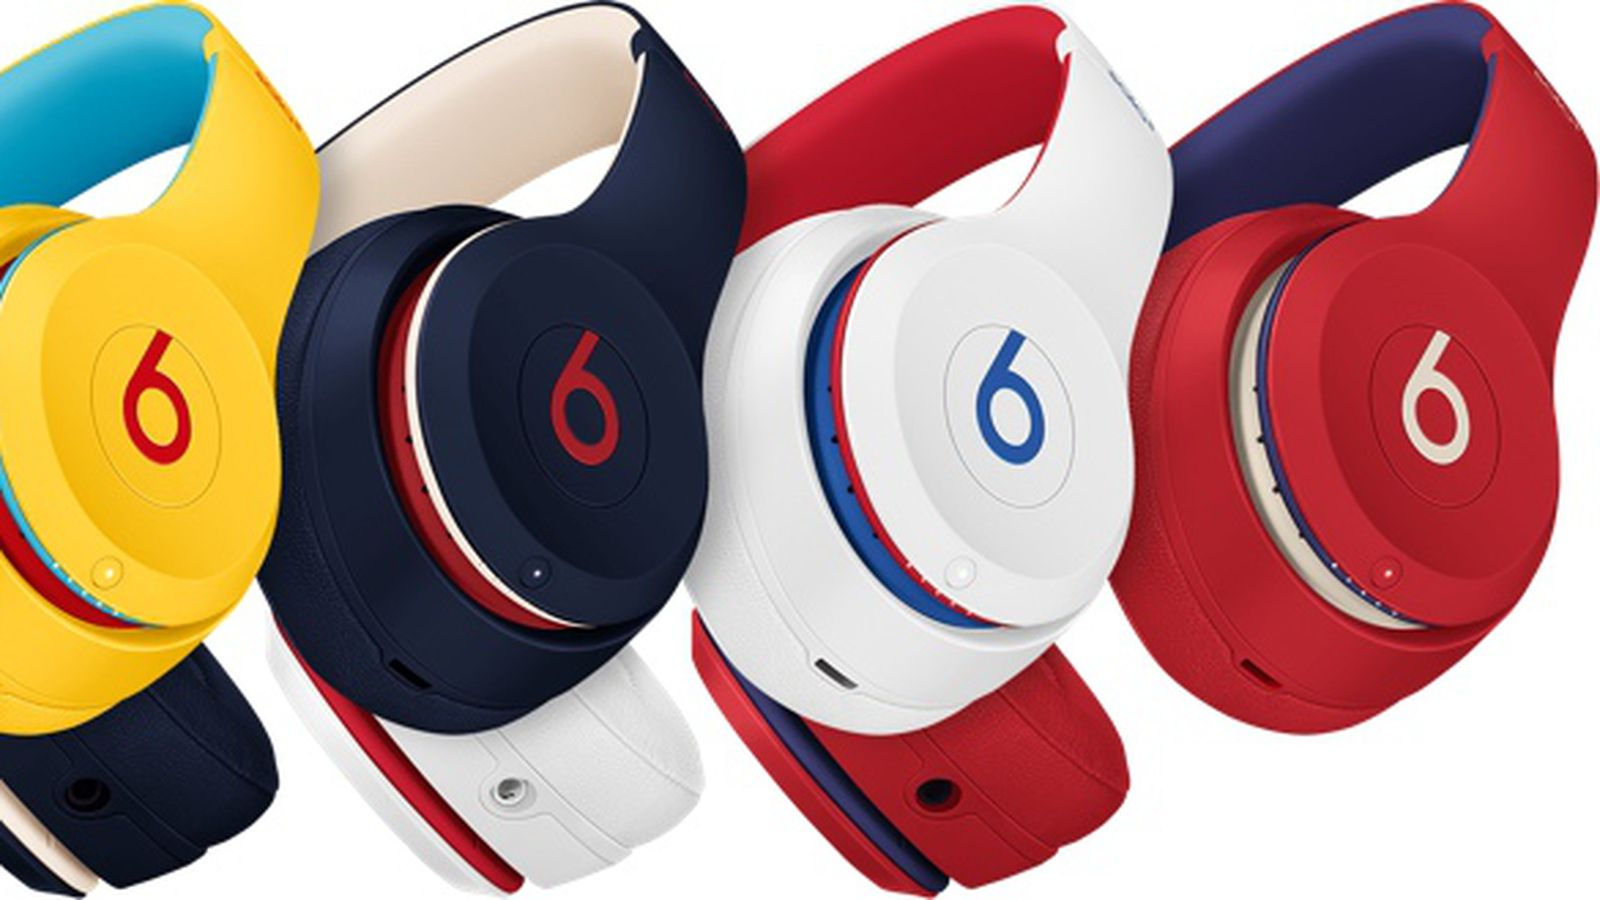 Apple S Beats Brand Launches New Beats Club Collection Solo3 Wireless Headphones Macrumors